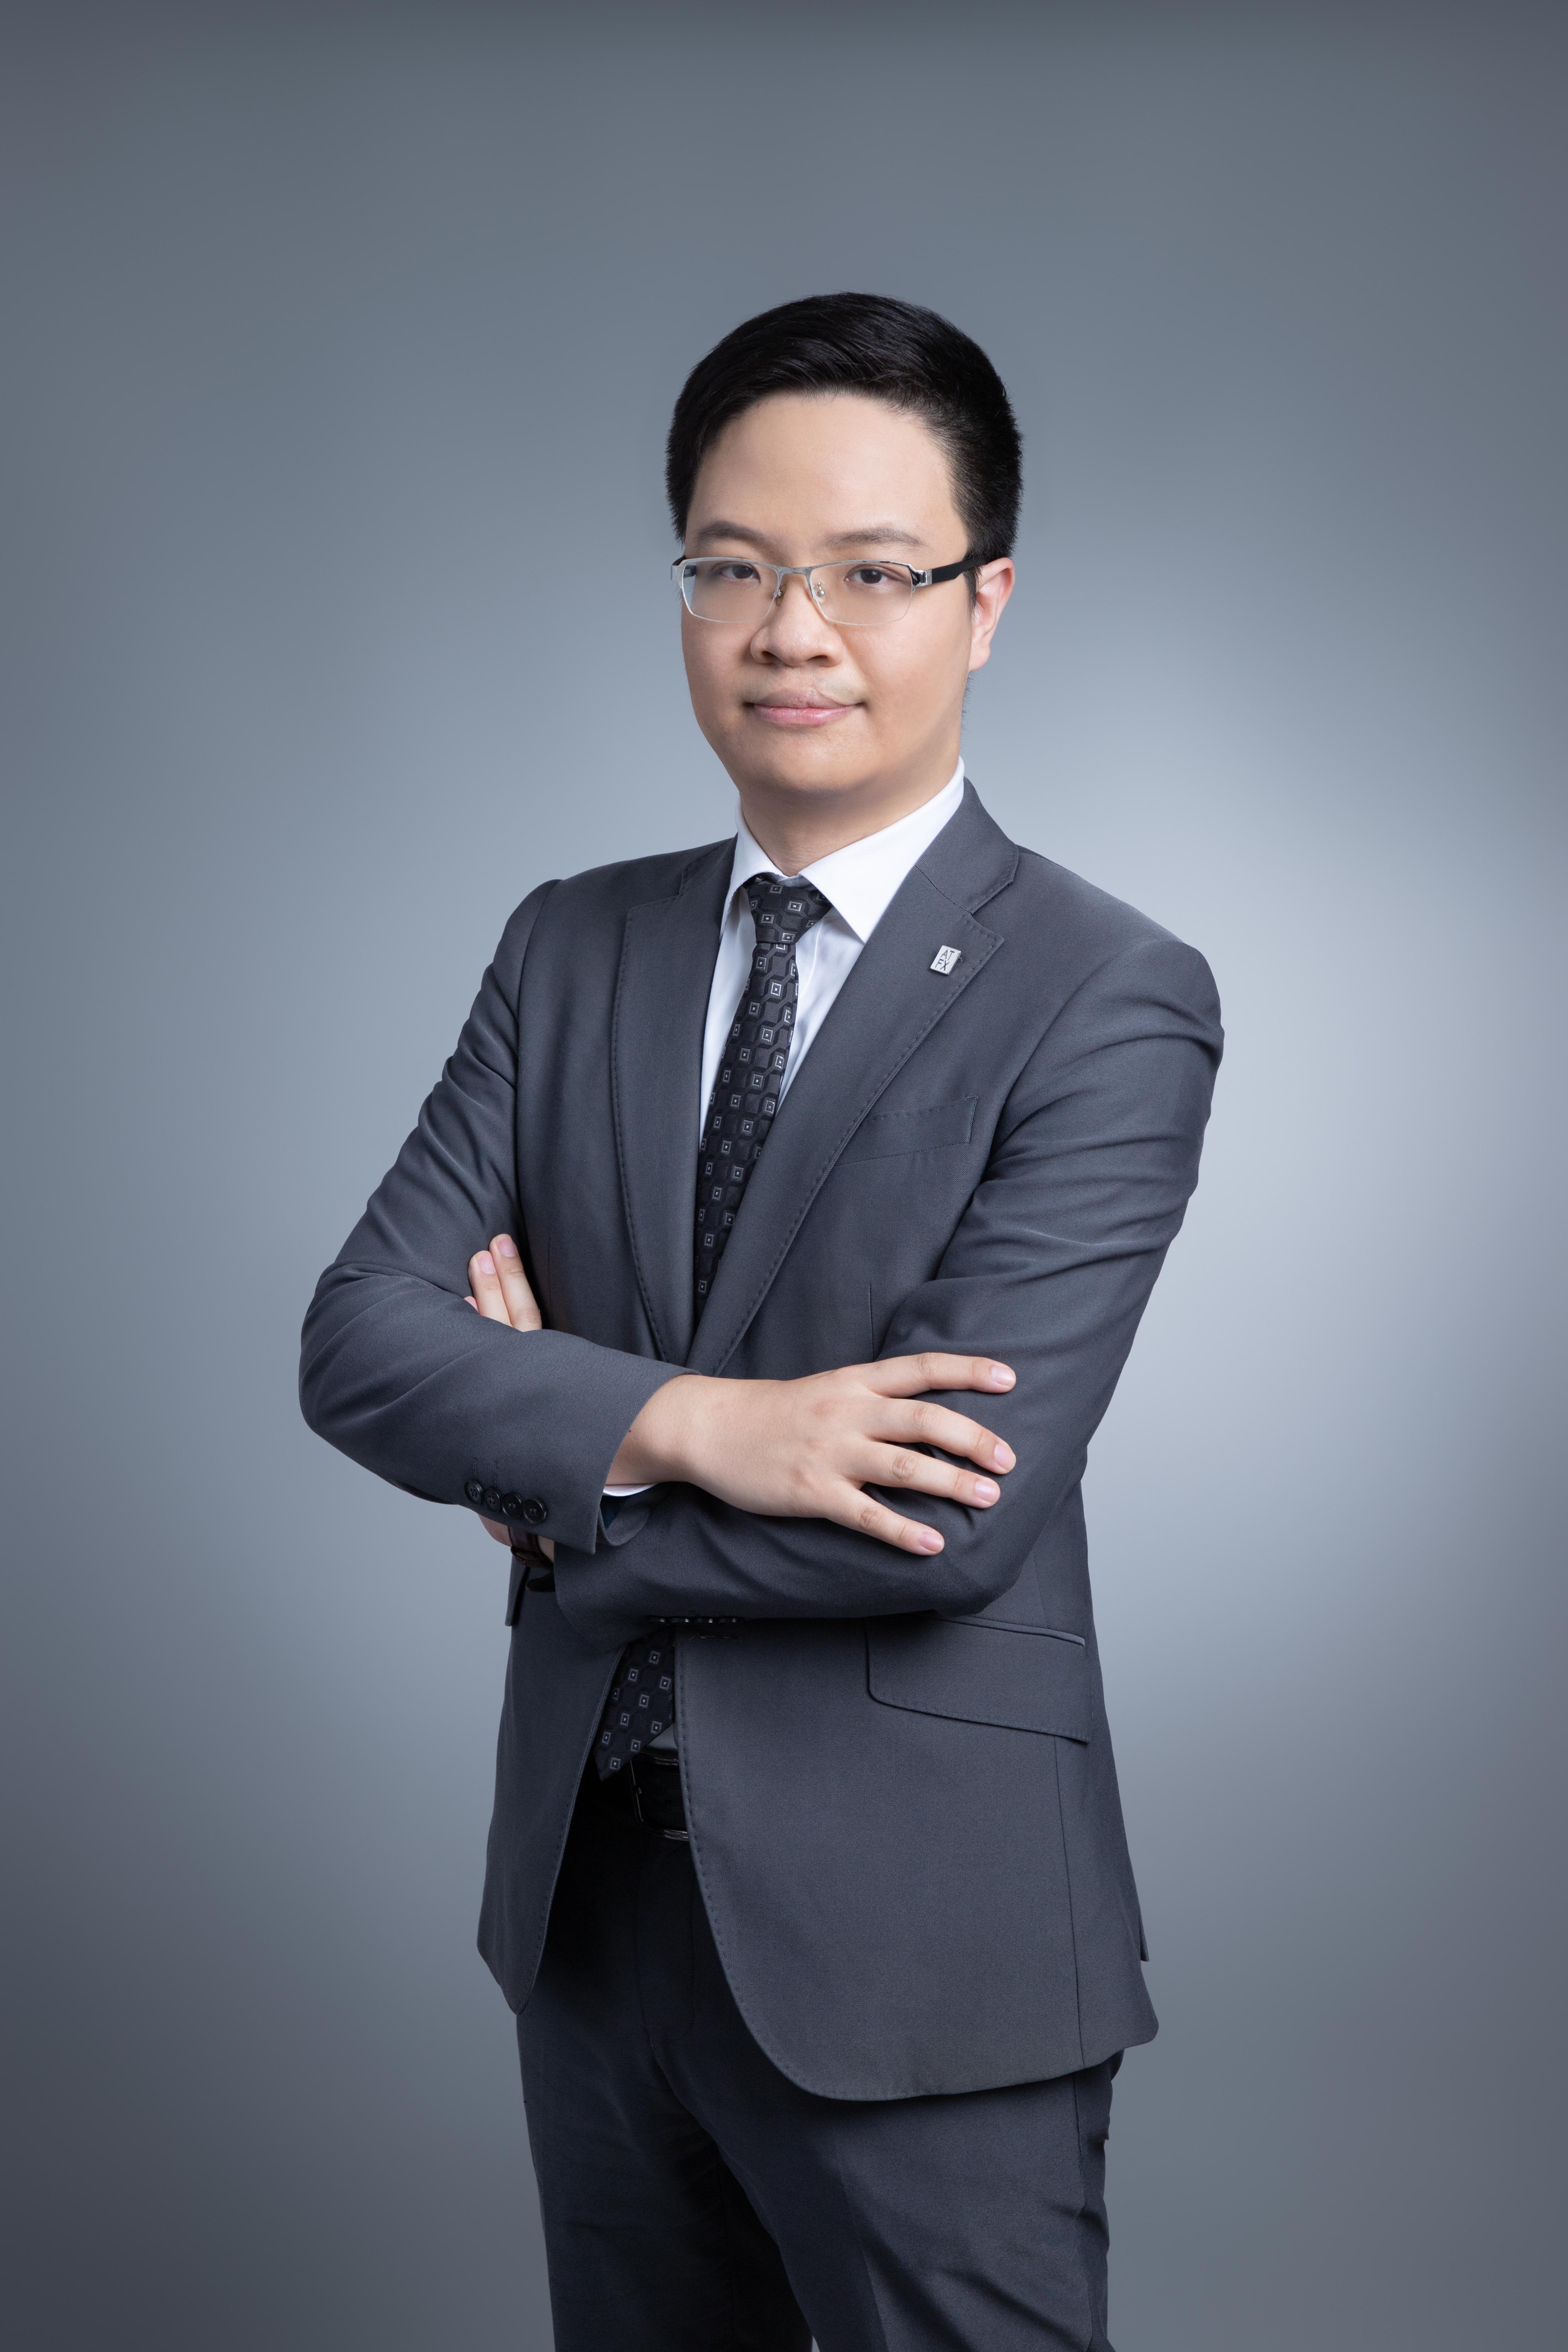 Jeffrey Siu